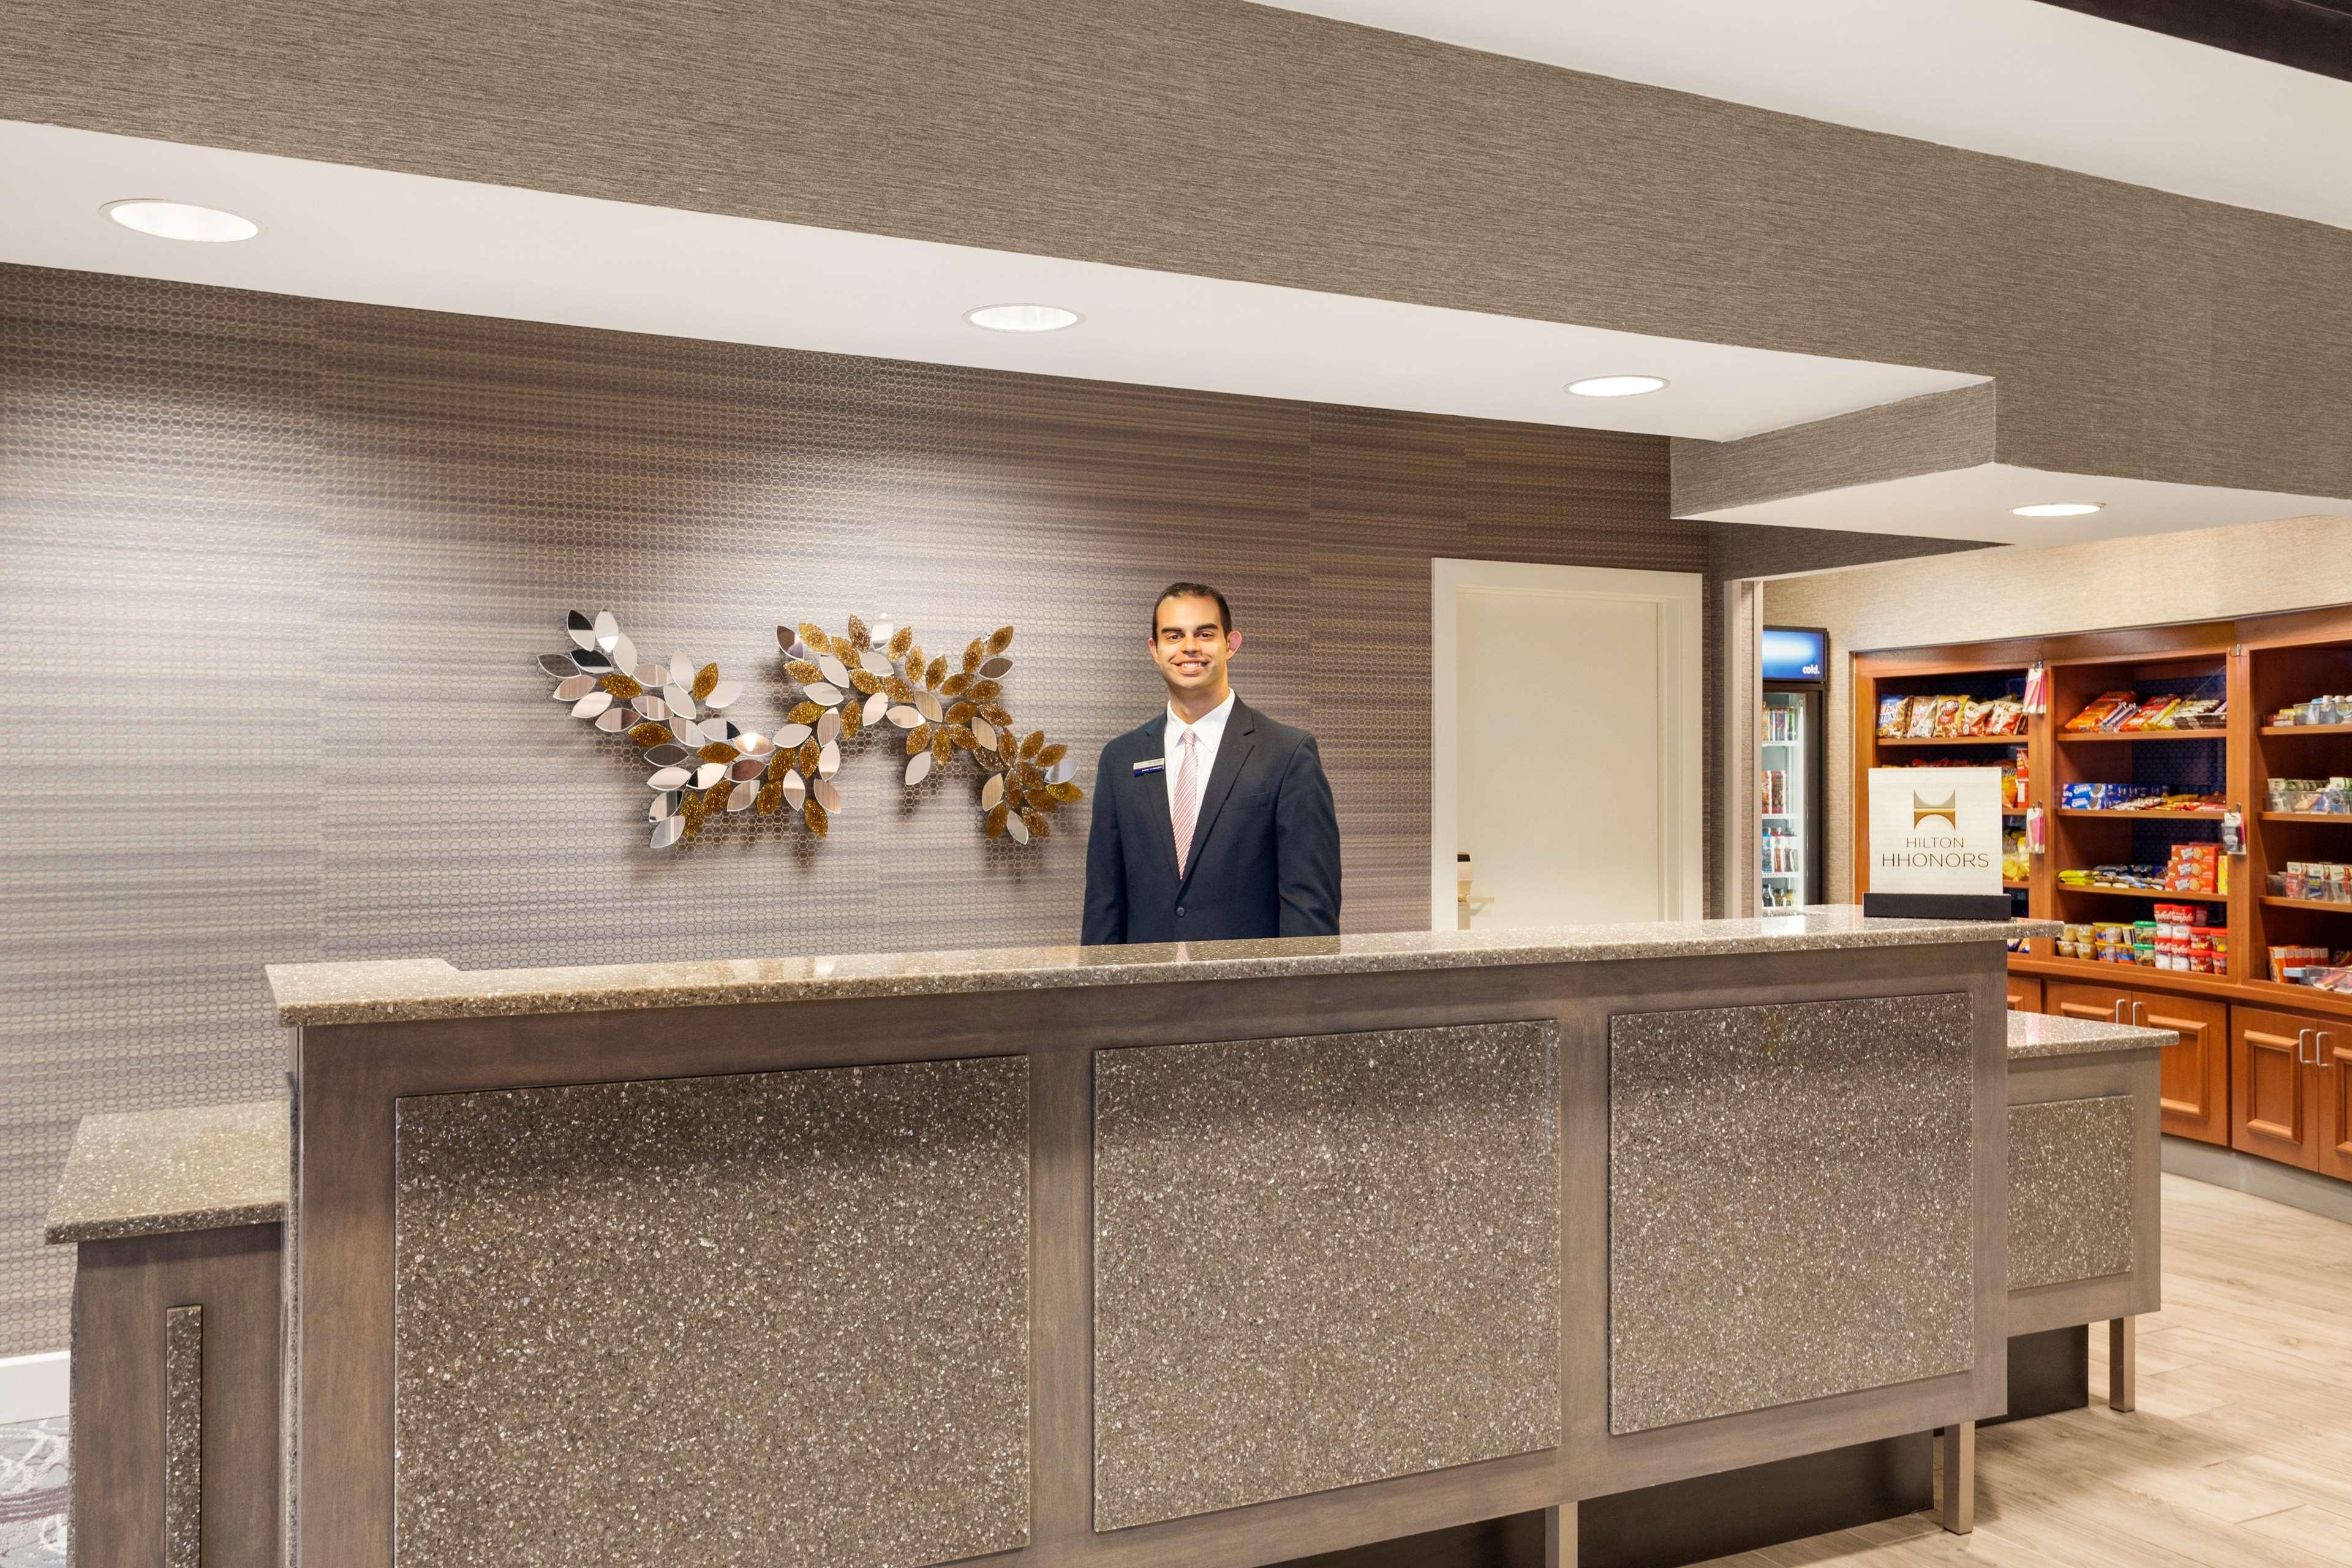 Hampton Inn & Suites Denver-Cherry Creek image 2